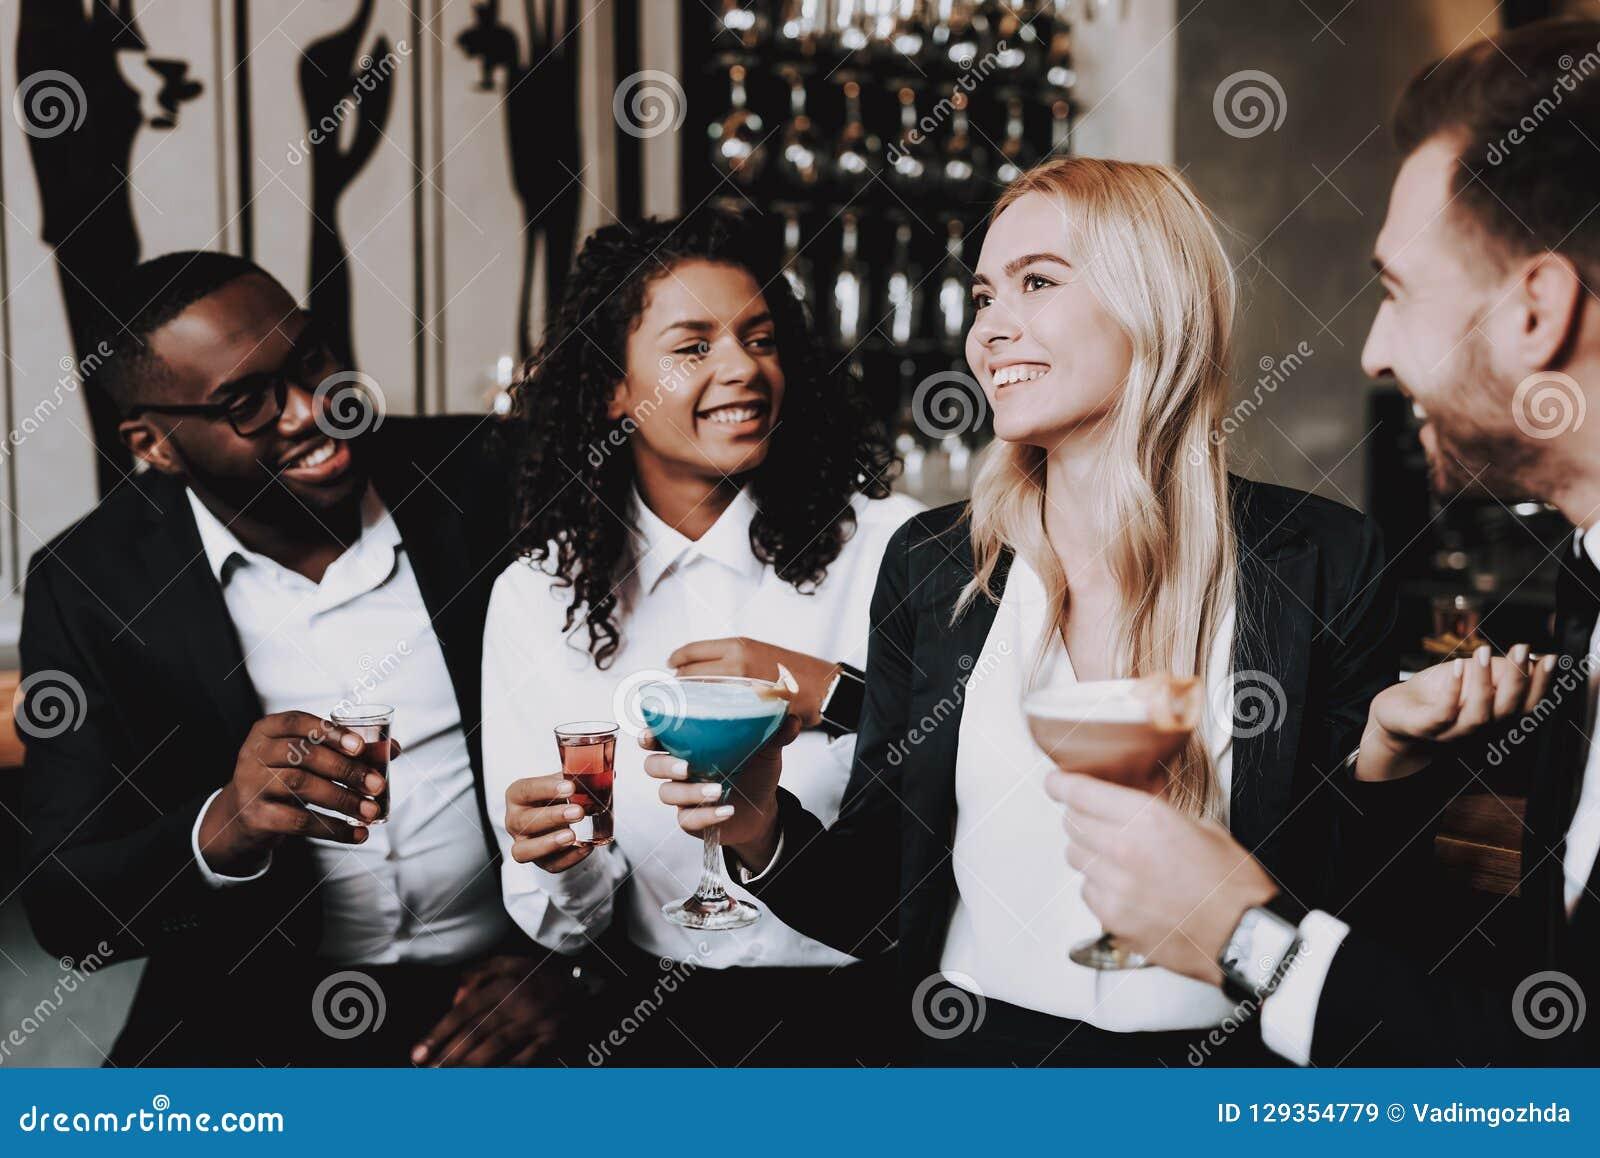 Kin-kin r Staaf drank clubbing